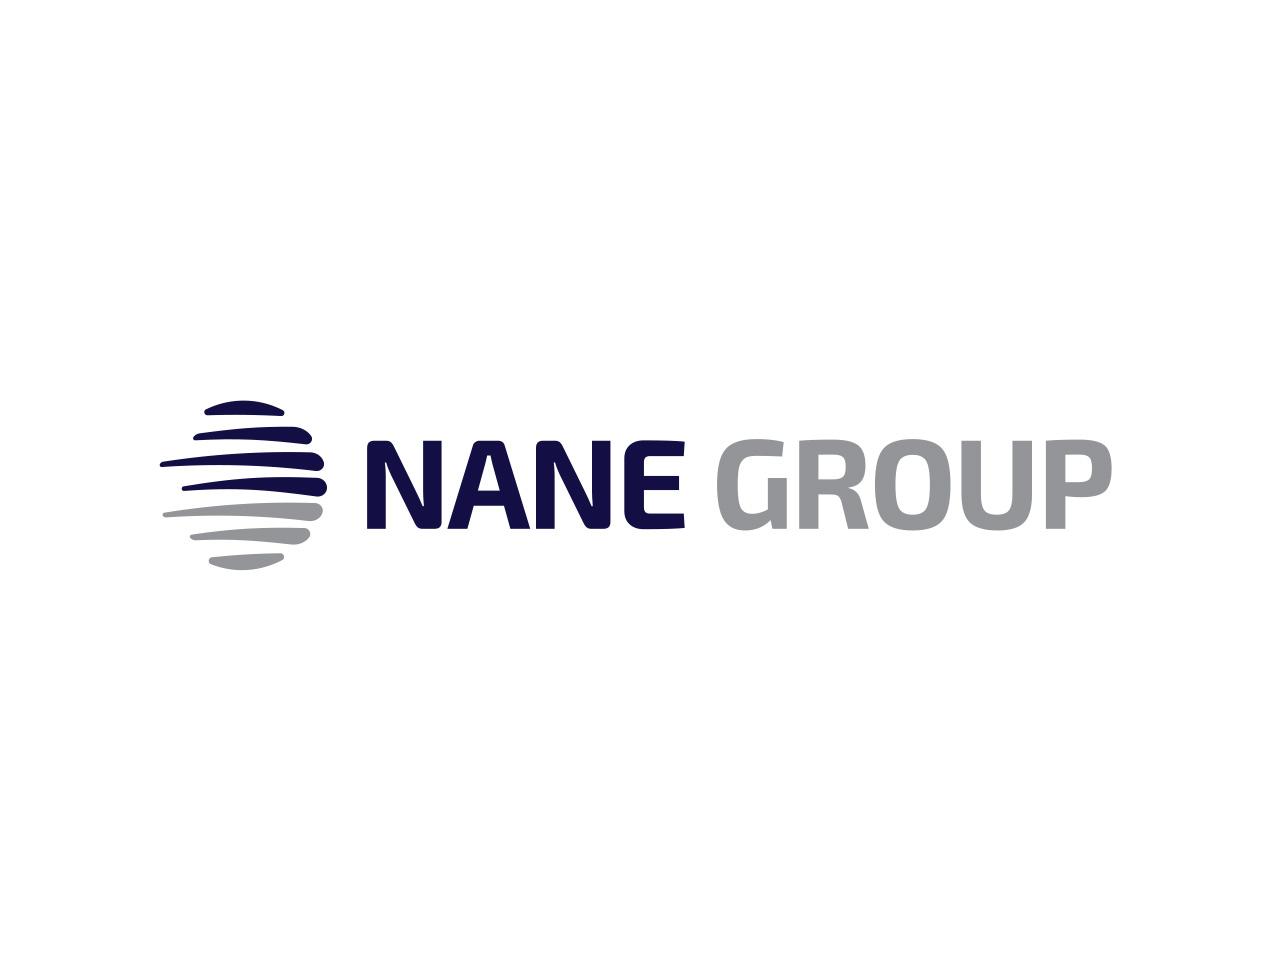 nane-group-logo-kurumsal-kimlik-tasarim-2